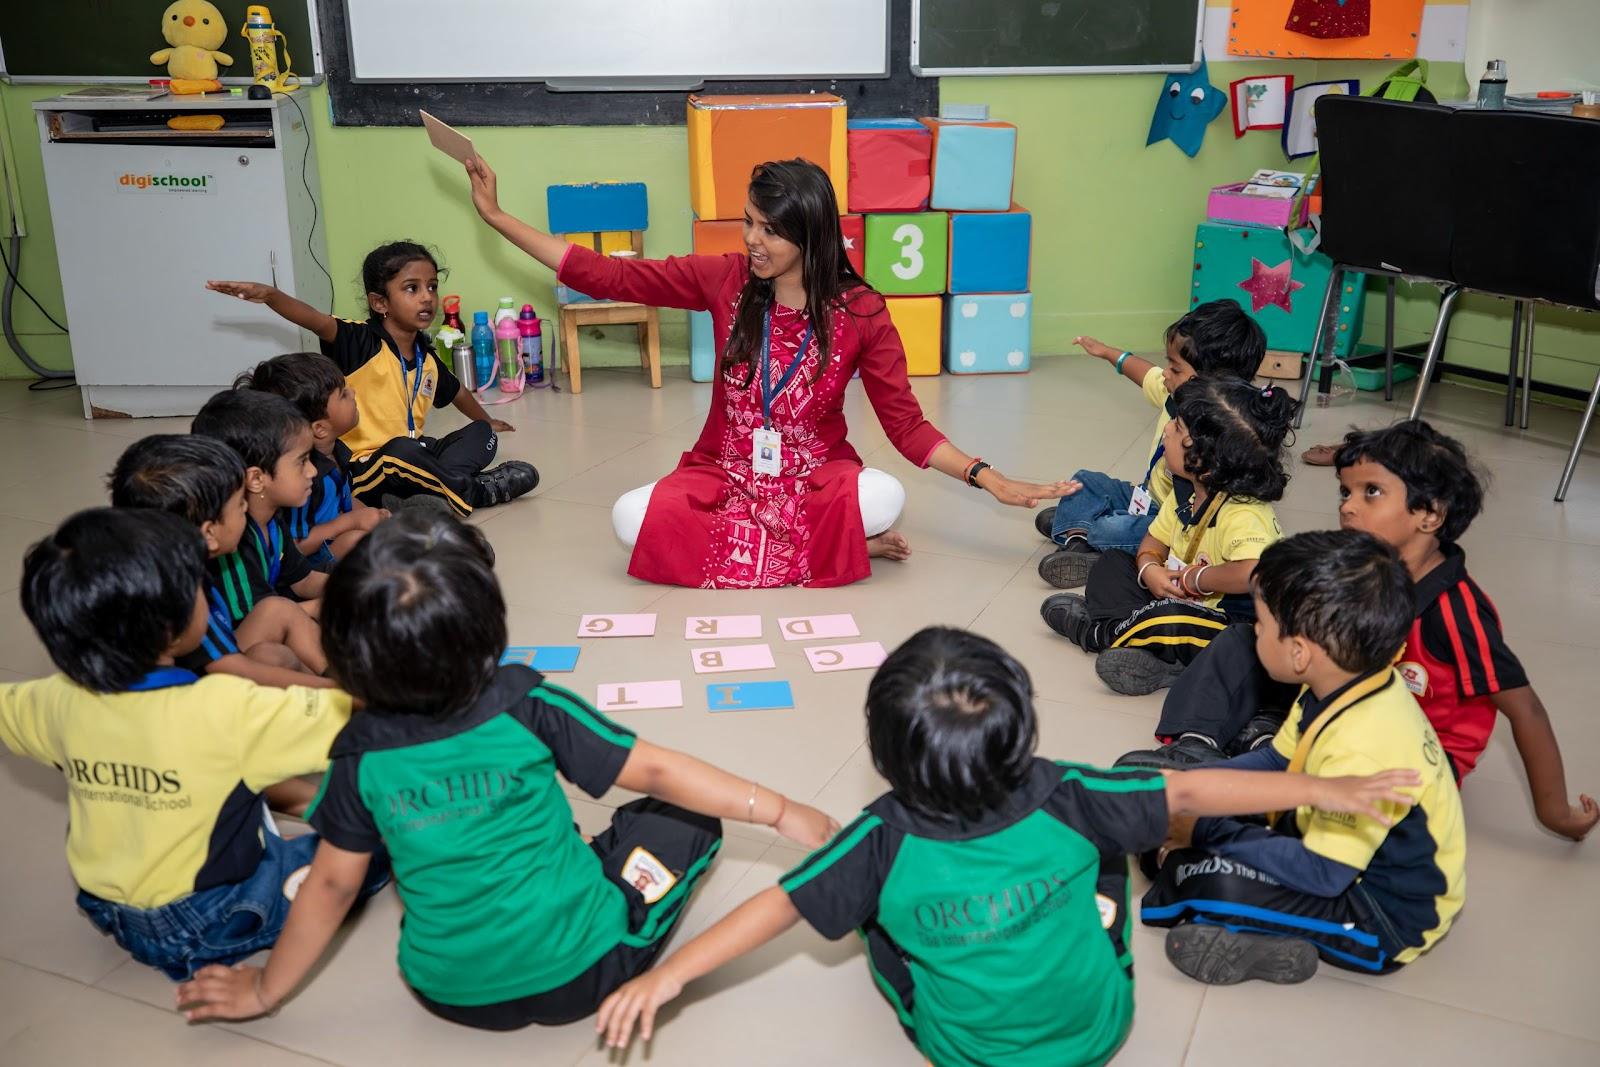 More teaching methods are explored in CBSE school